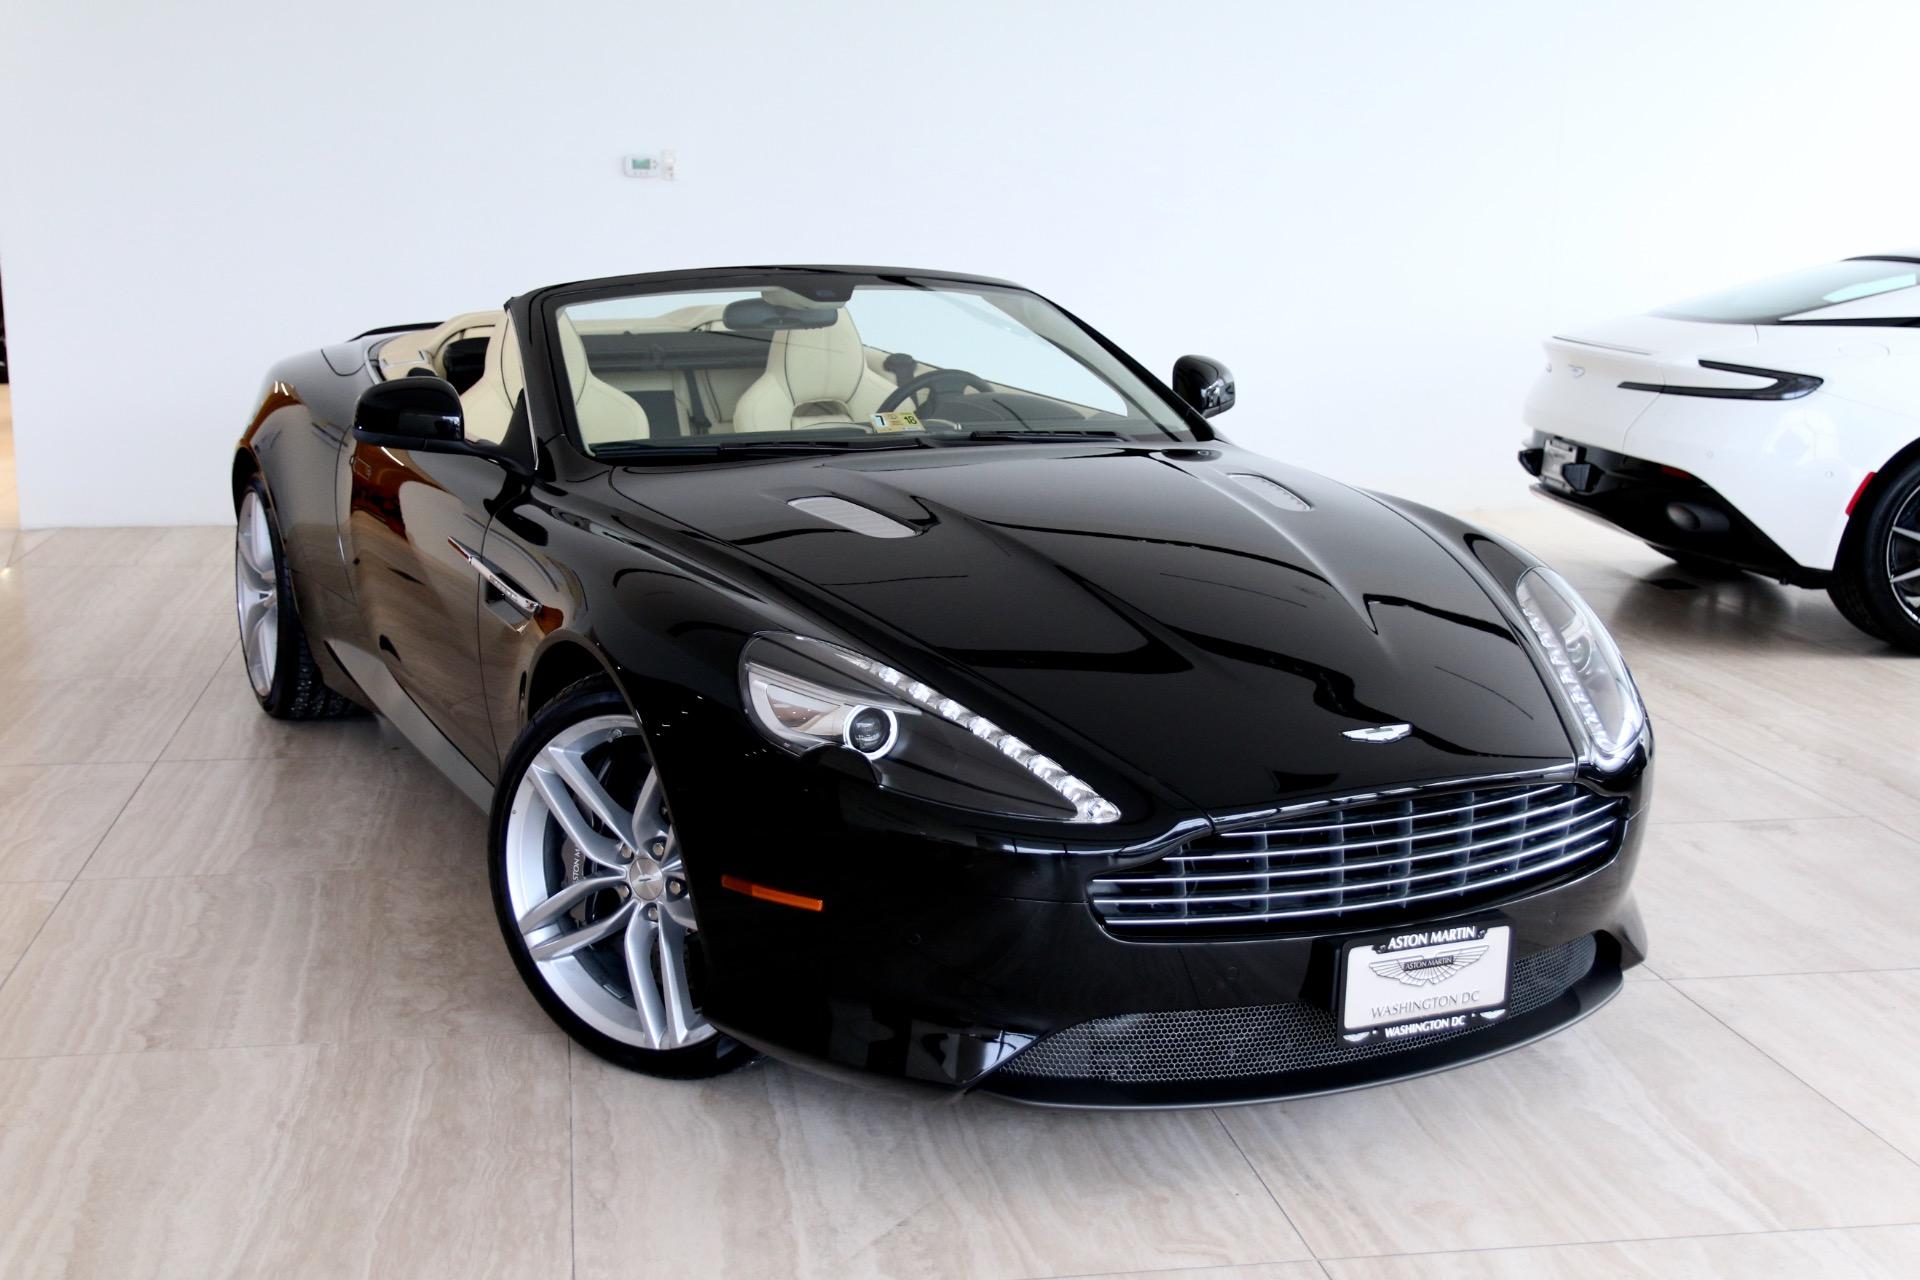 2015 Aston Martin Db9 Volante Stock 8n019834a For Sale Near Vienna